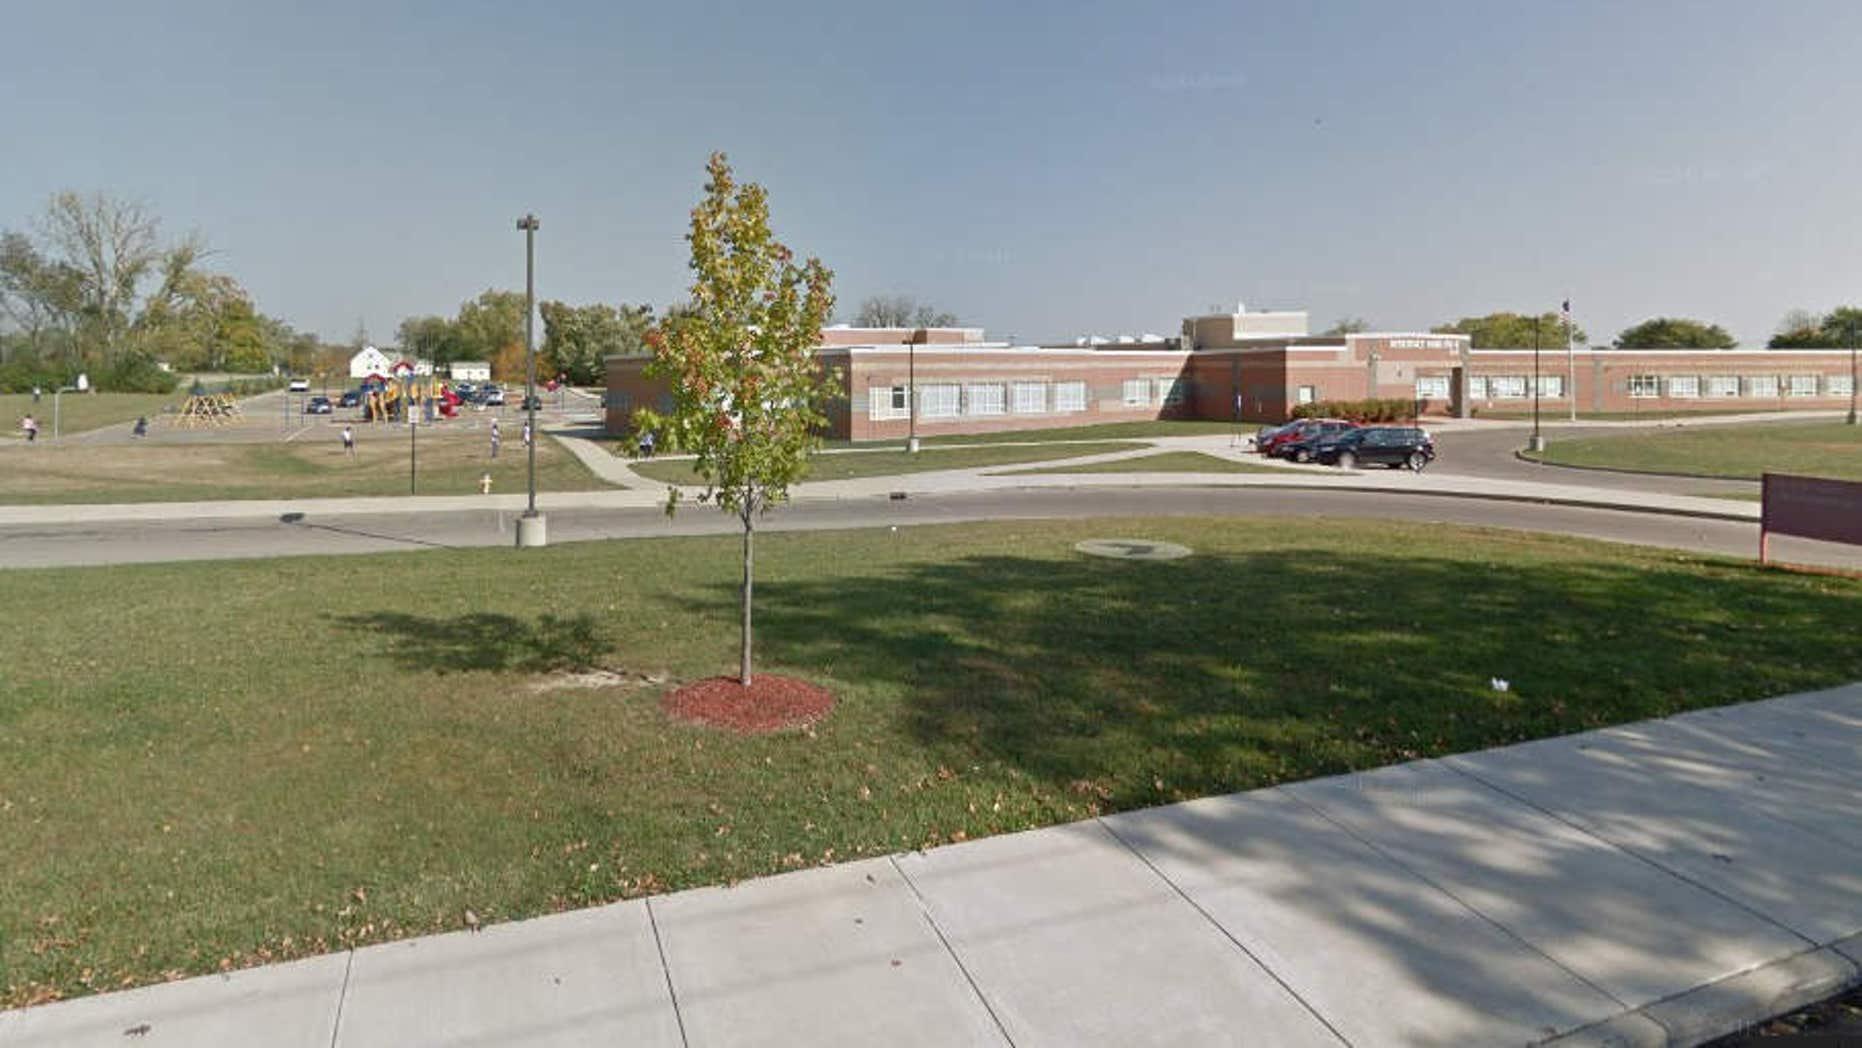 World of Wonder school in Dayton, Ohio.